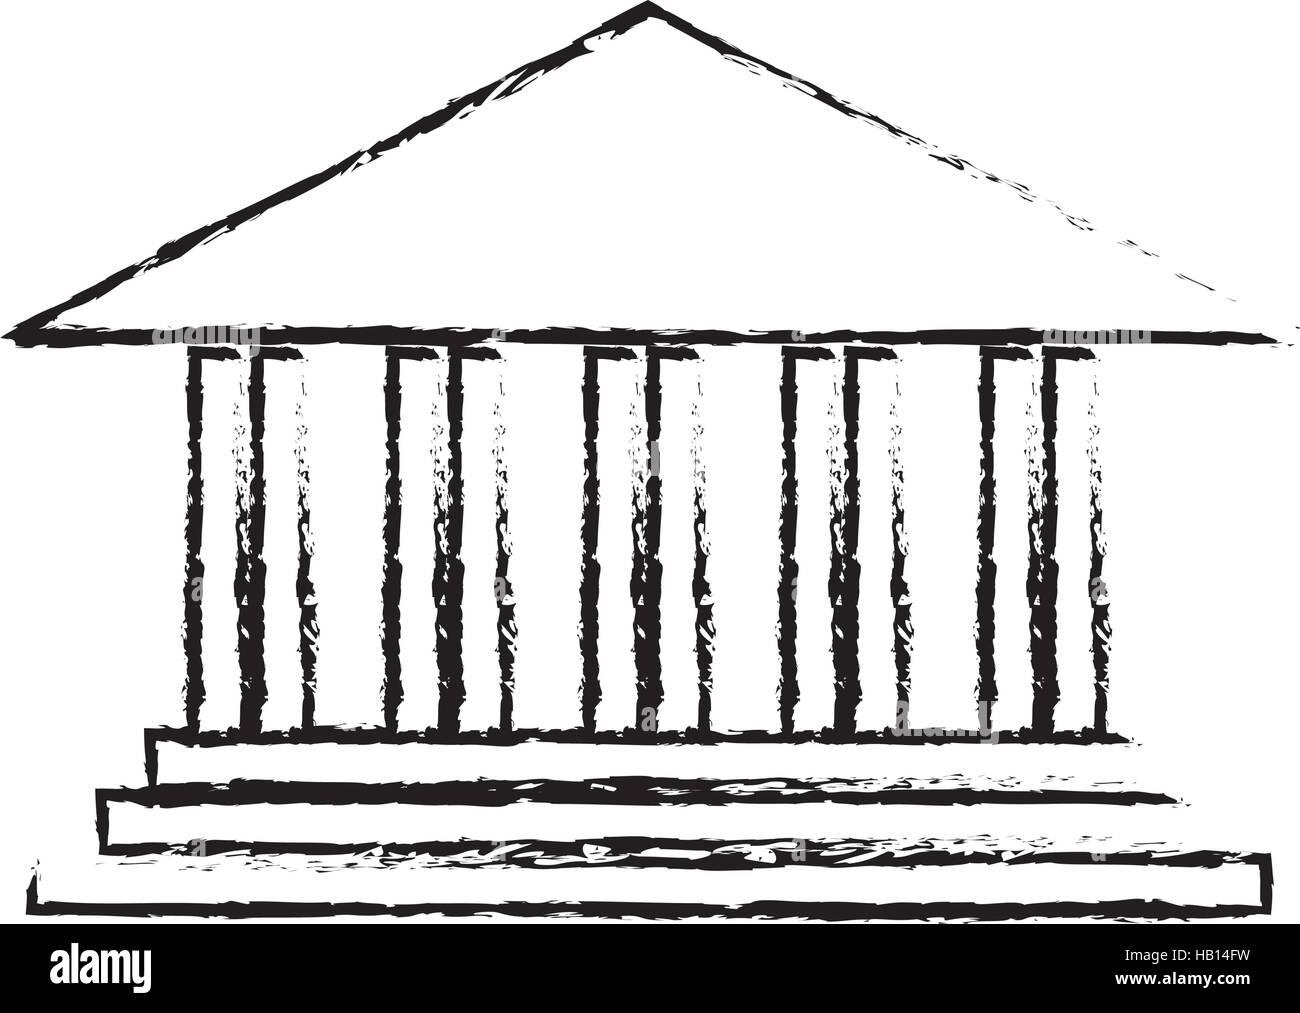 ancient greek building icon image vector illustration design - Stock Vector